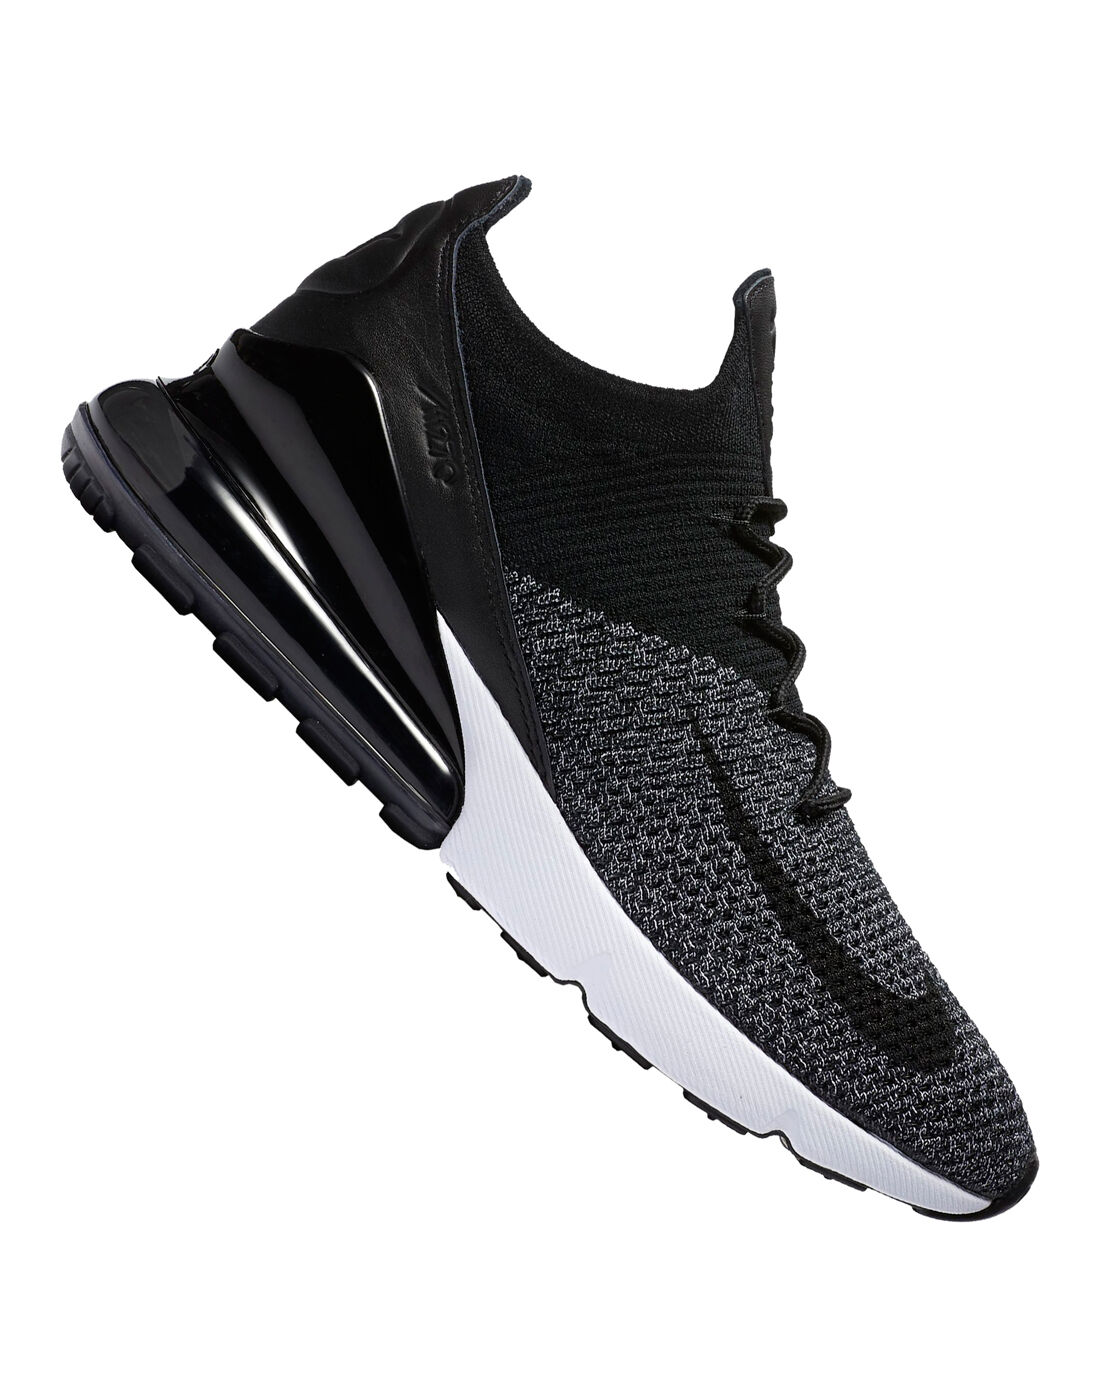 Nike Air Max 270 Flyknit Oreo | Life Style Sports